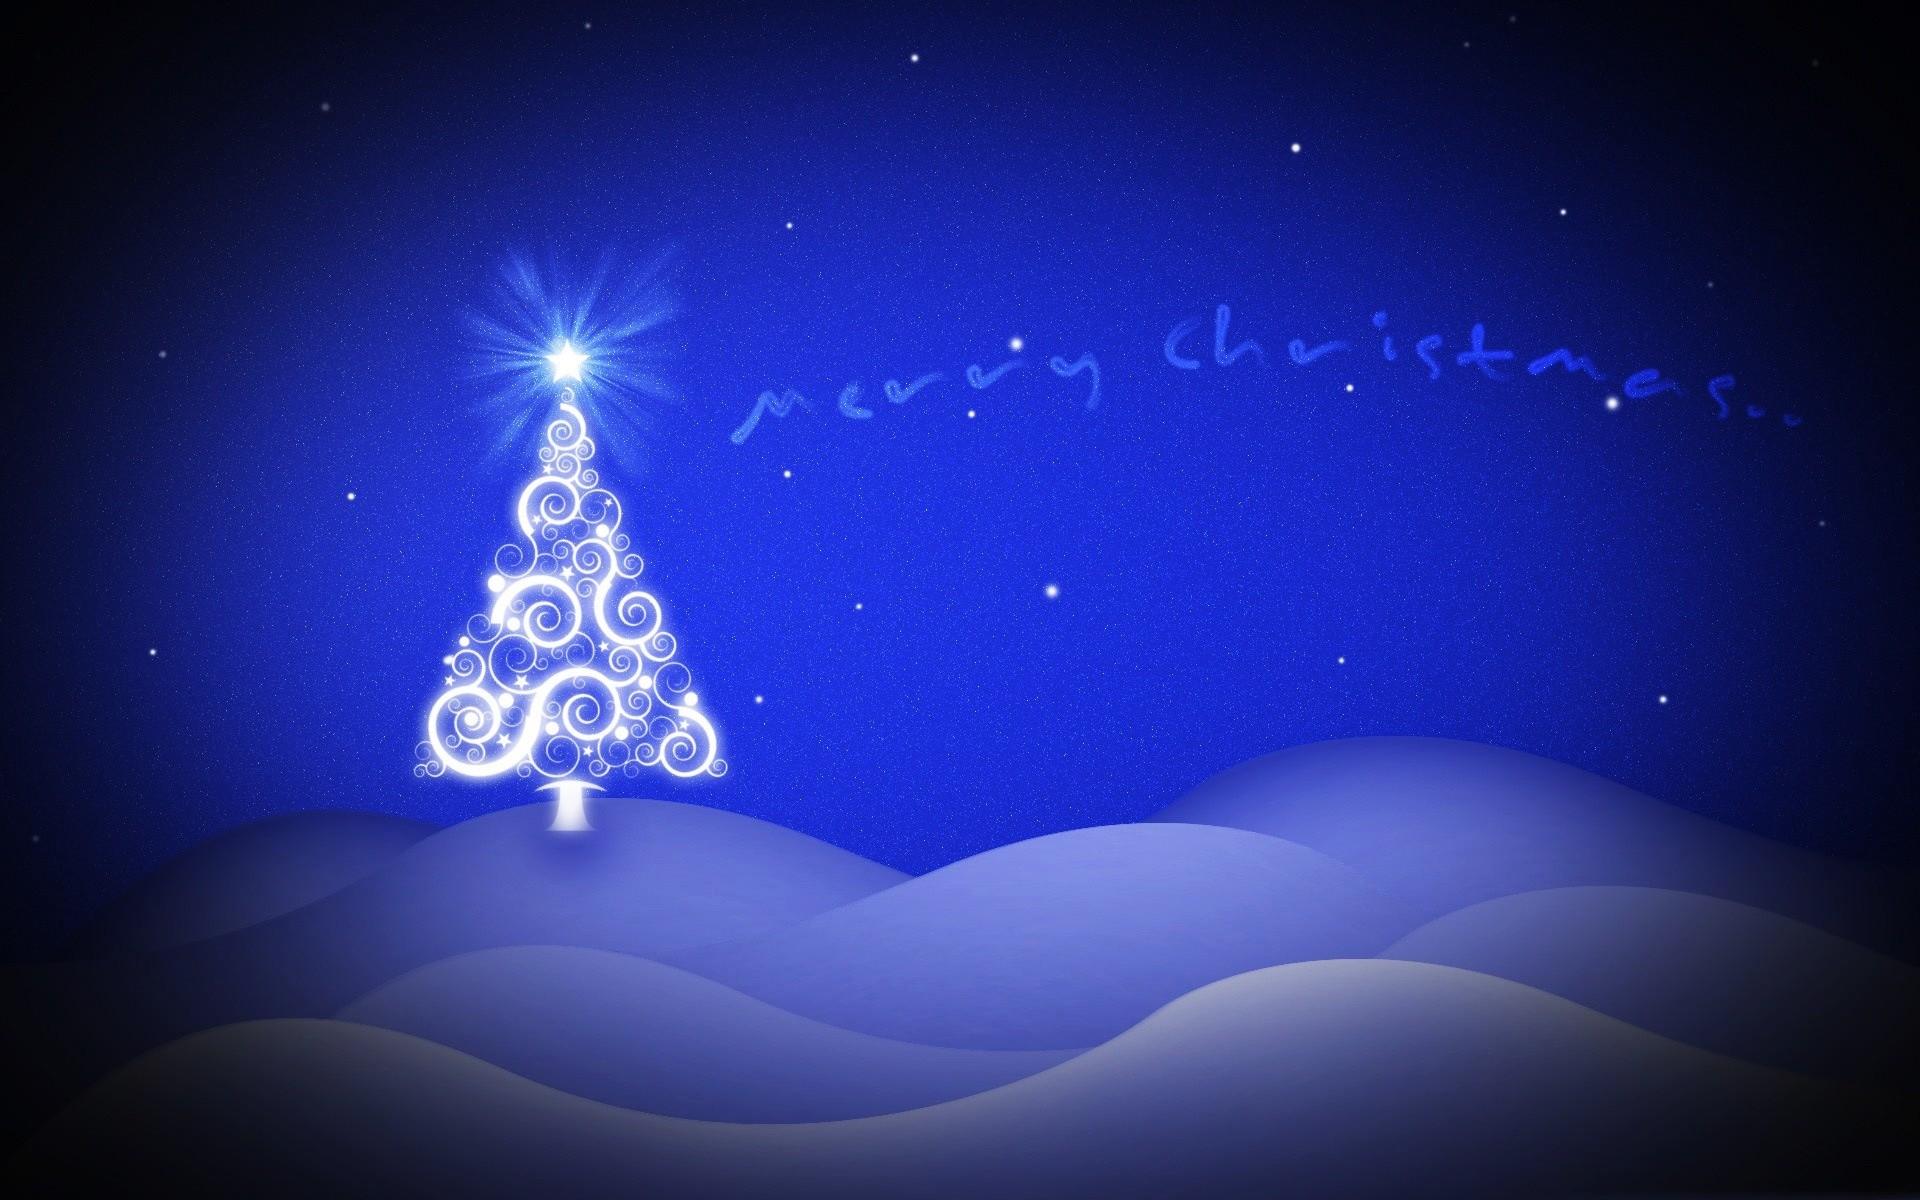 1920x1080 Snow Cute Polar Christmas Tree Winter Decorate Bears Animated Wallpaper Windows 7 Detail